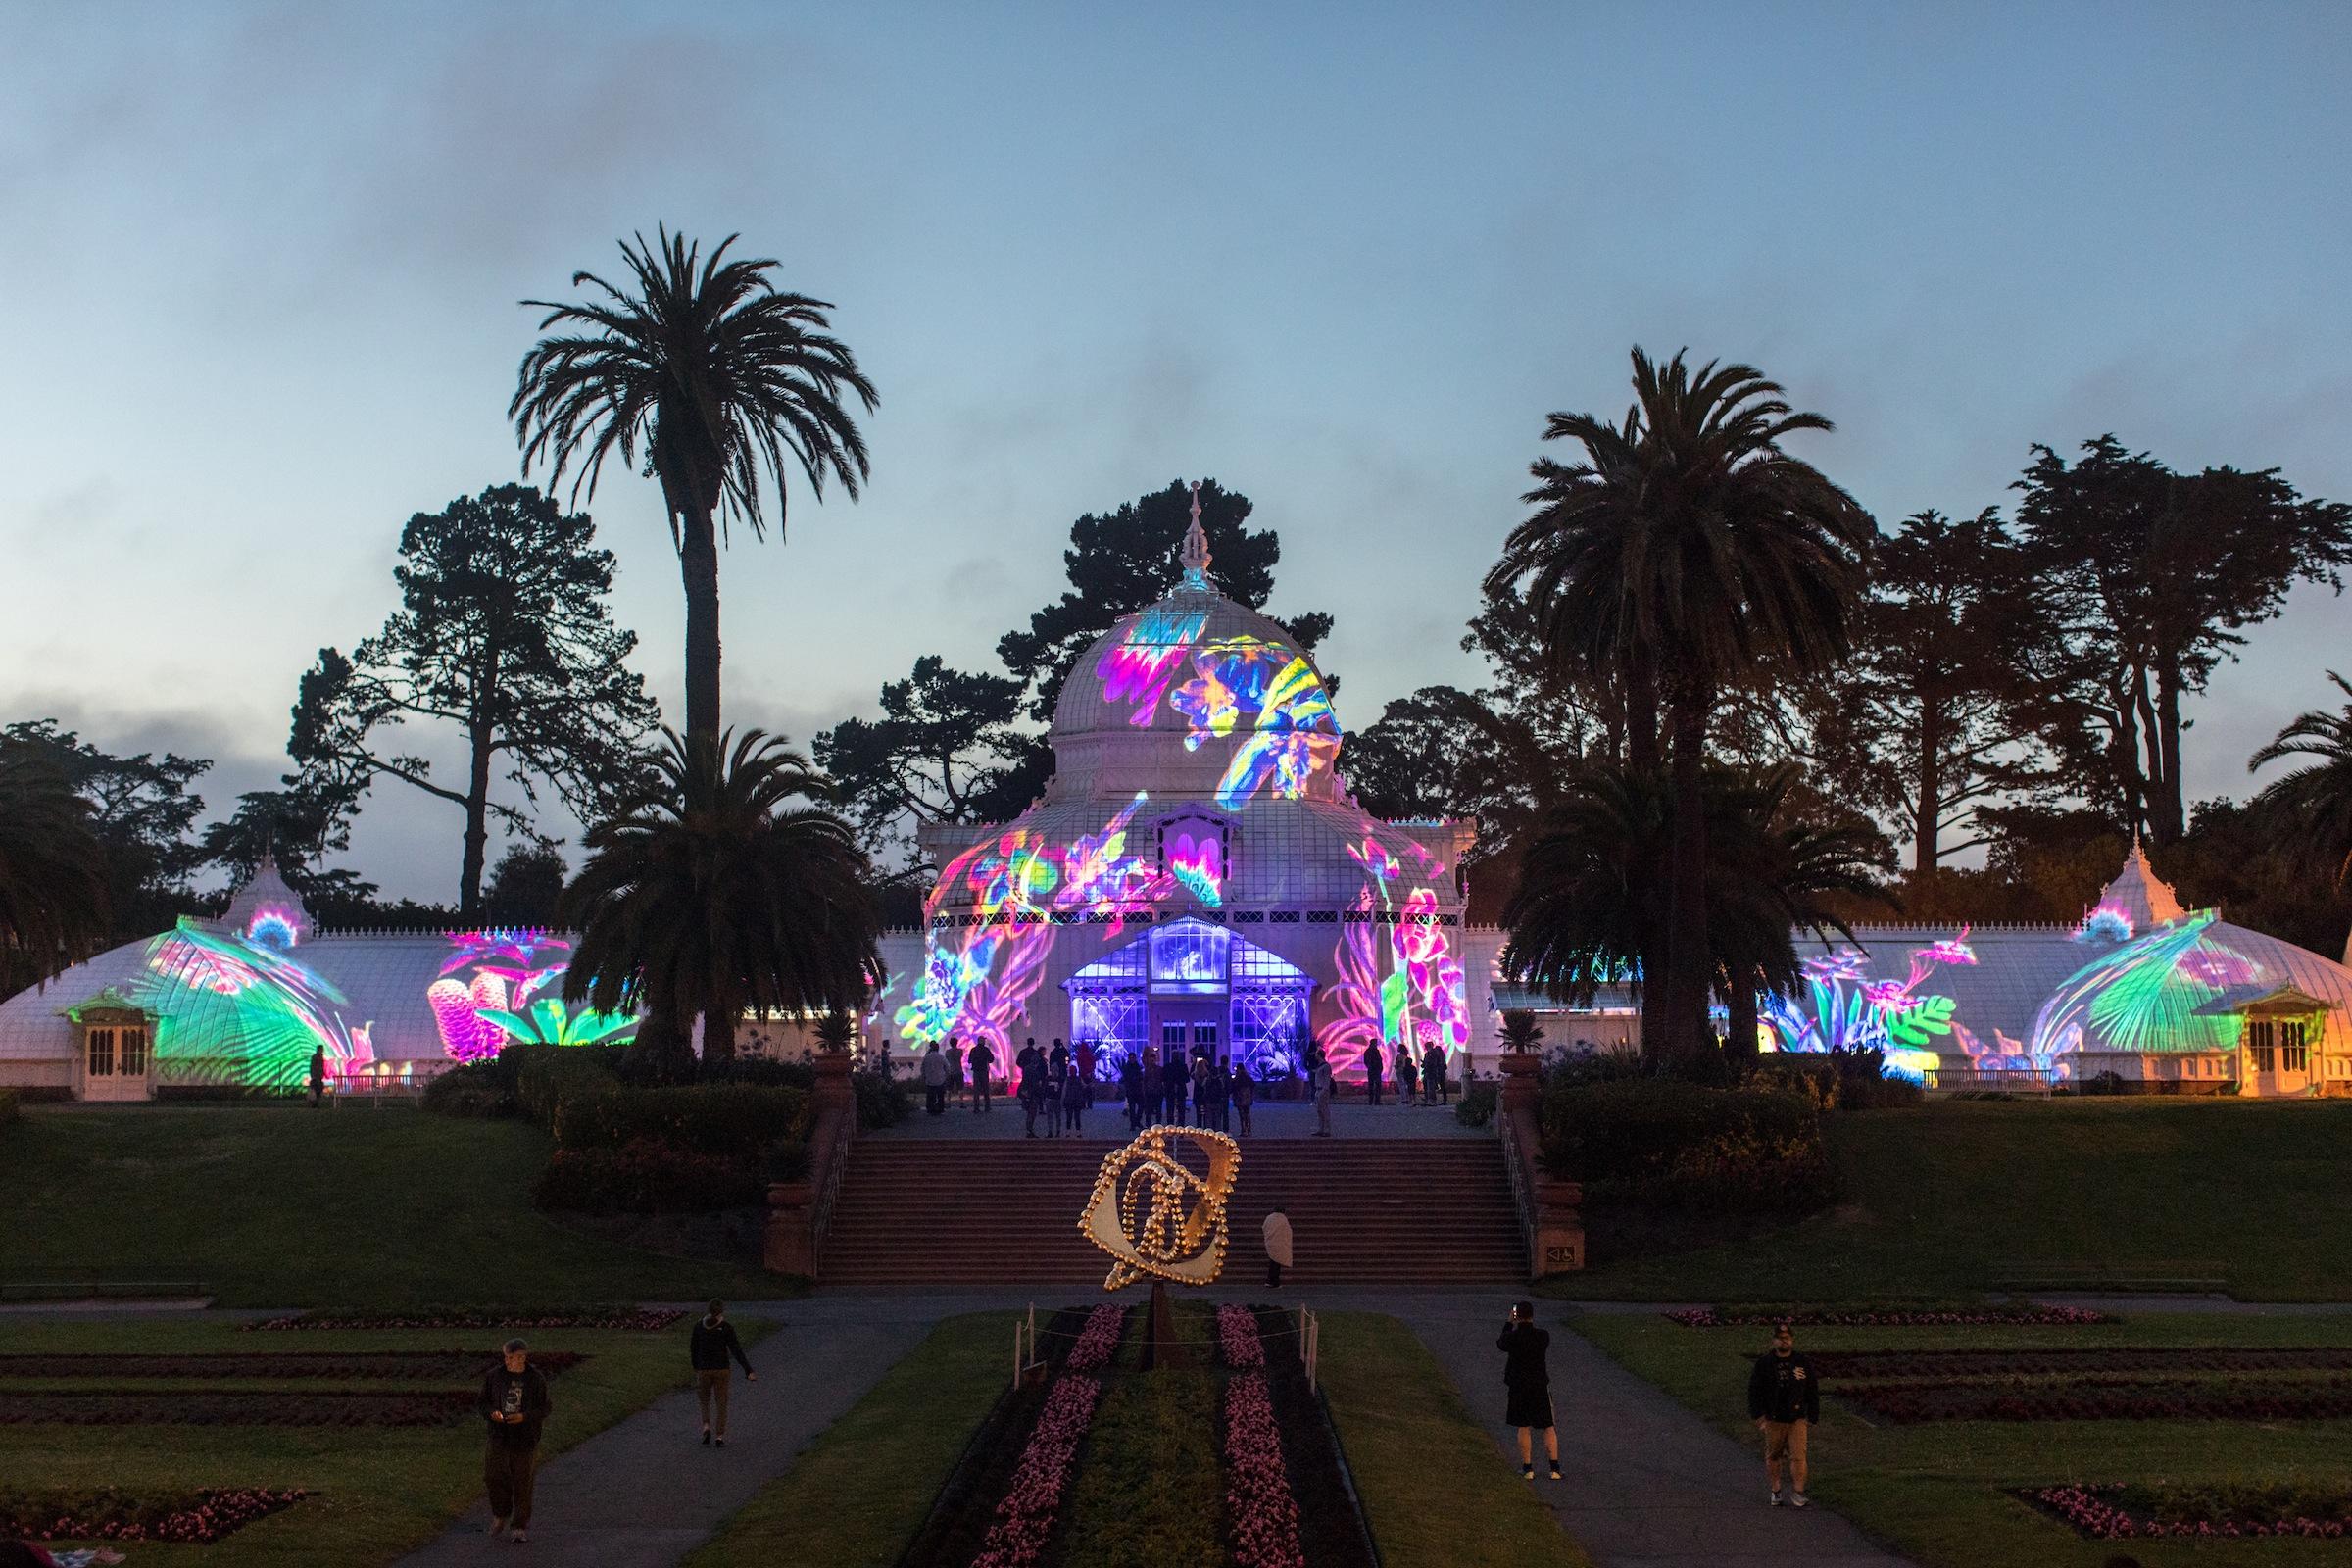 Conservatory of Flowers 'Summer of Love' light show extends into autumn (update)